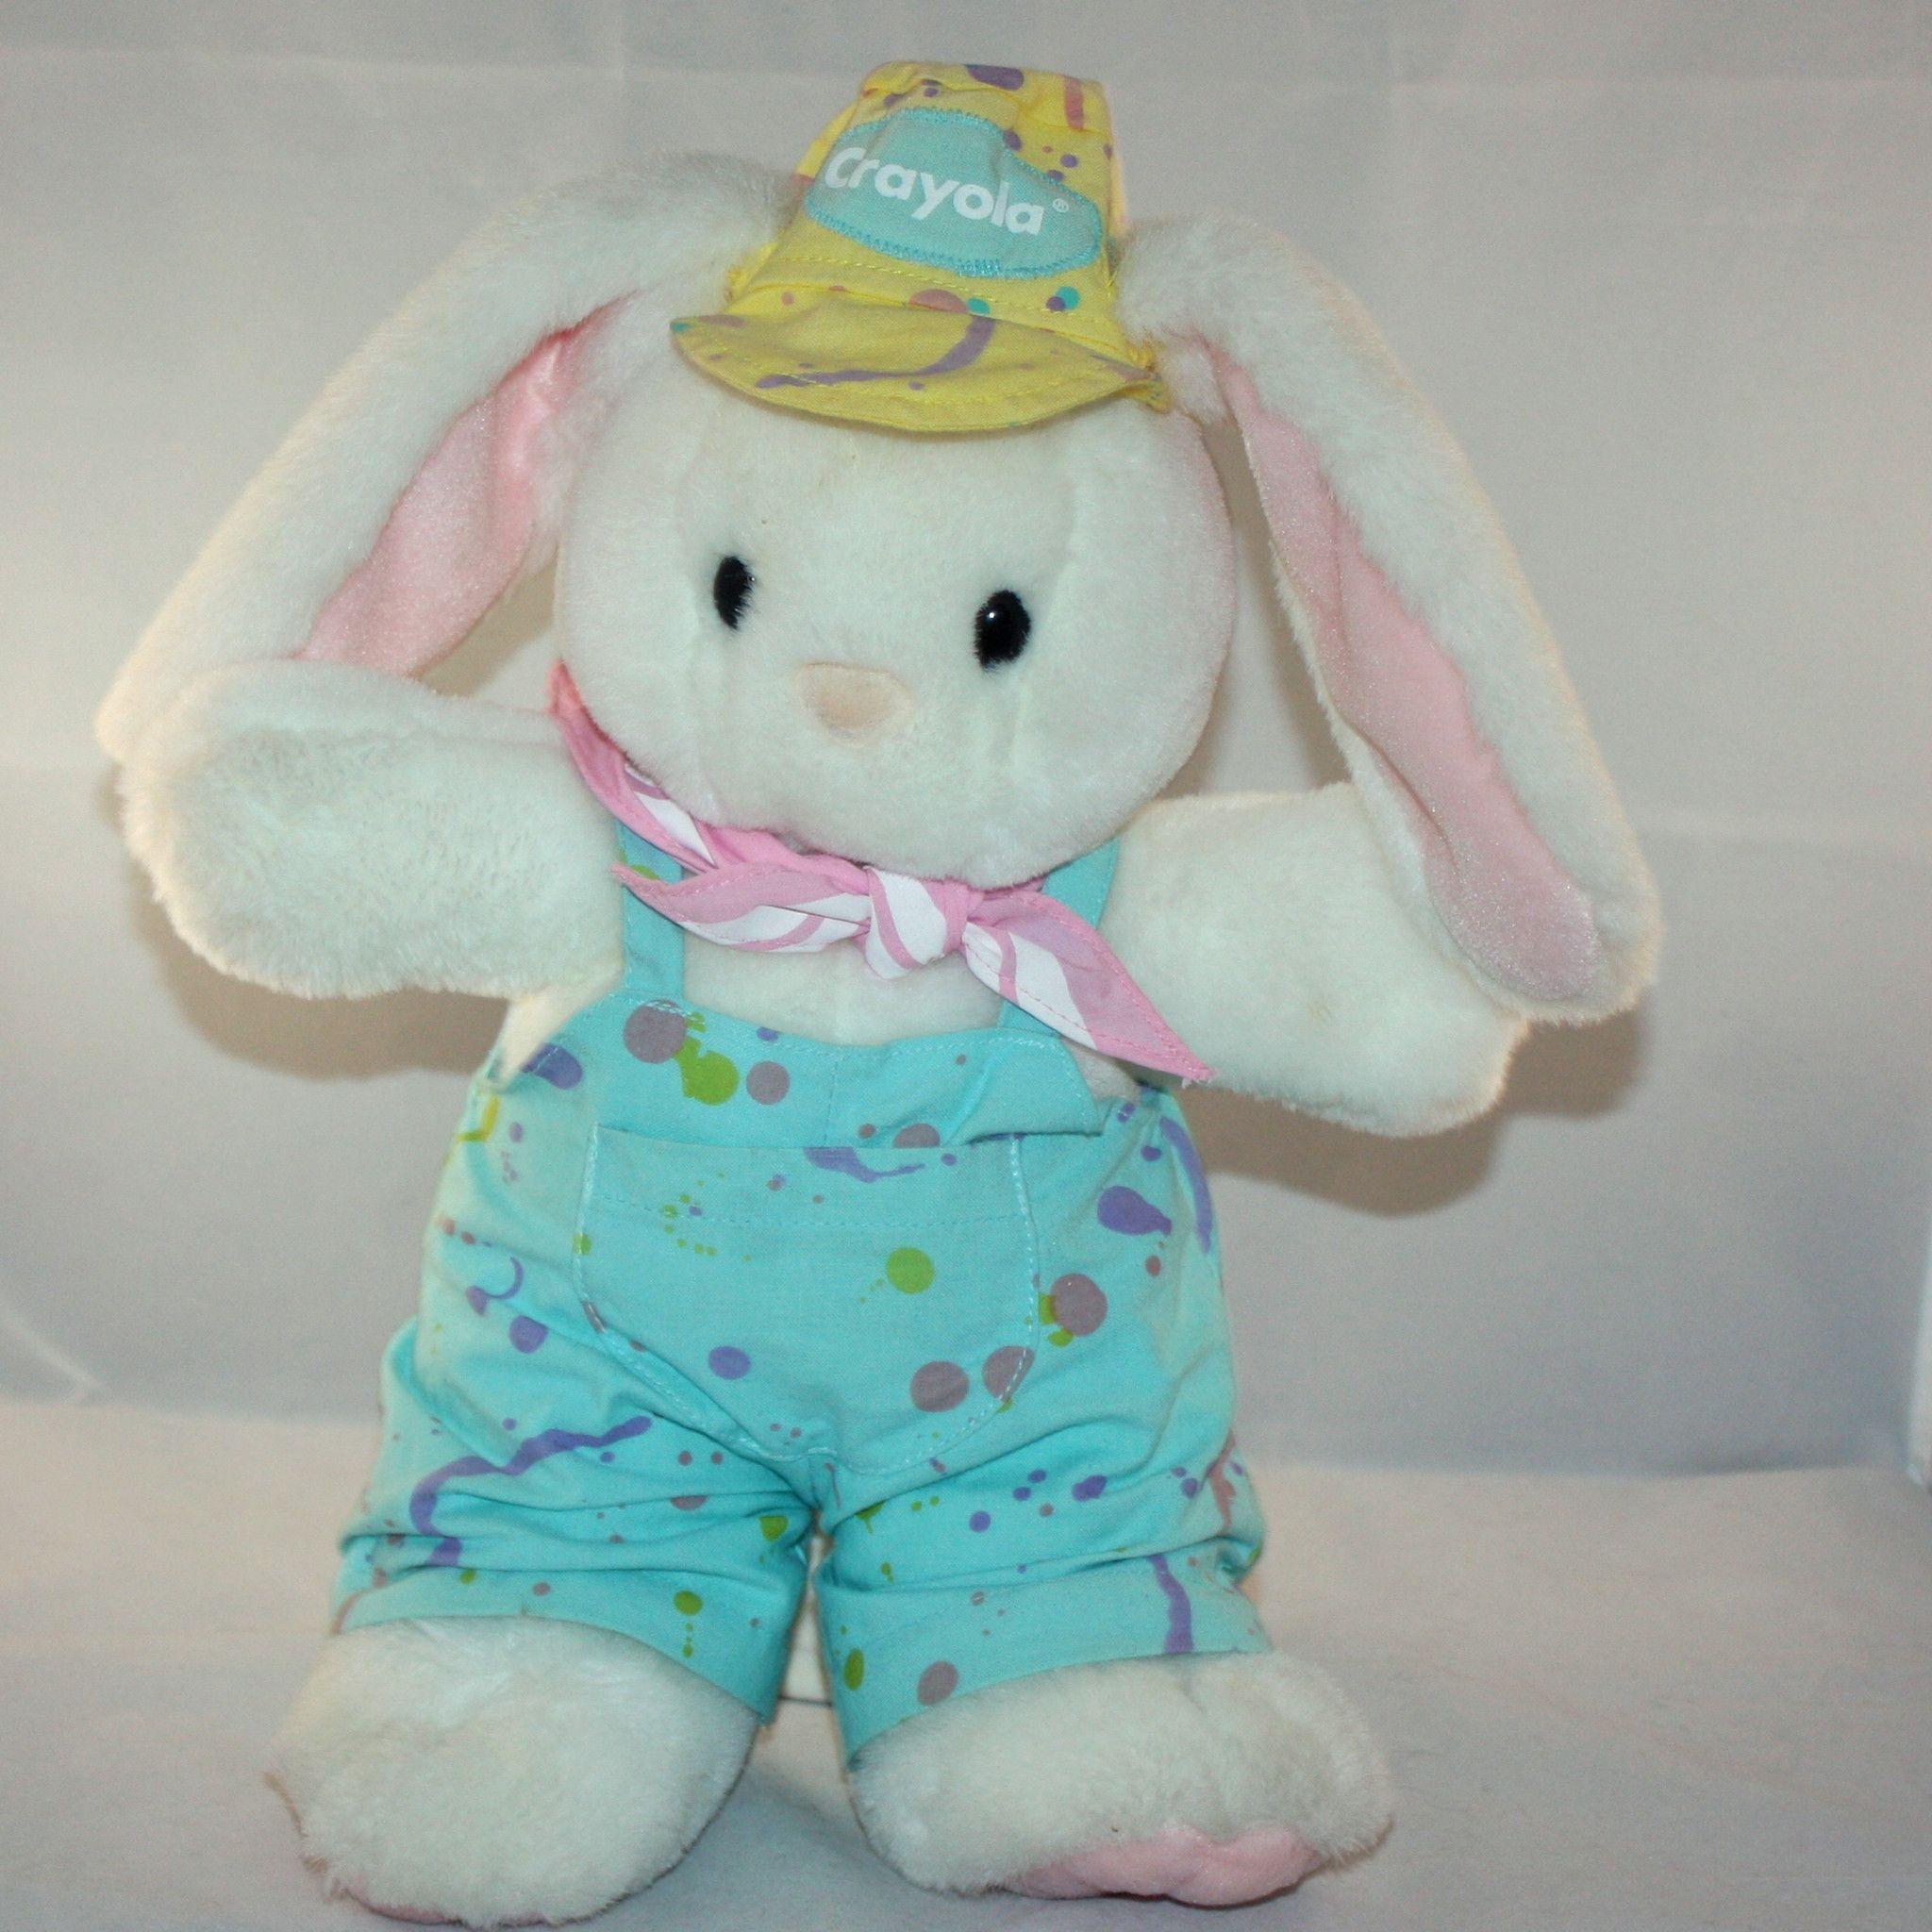 1990 Hallmark Heartline Crayola Bunny Rabbit Bunny Stuffed Animals Cute Toys Vintage Plush